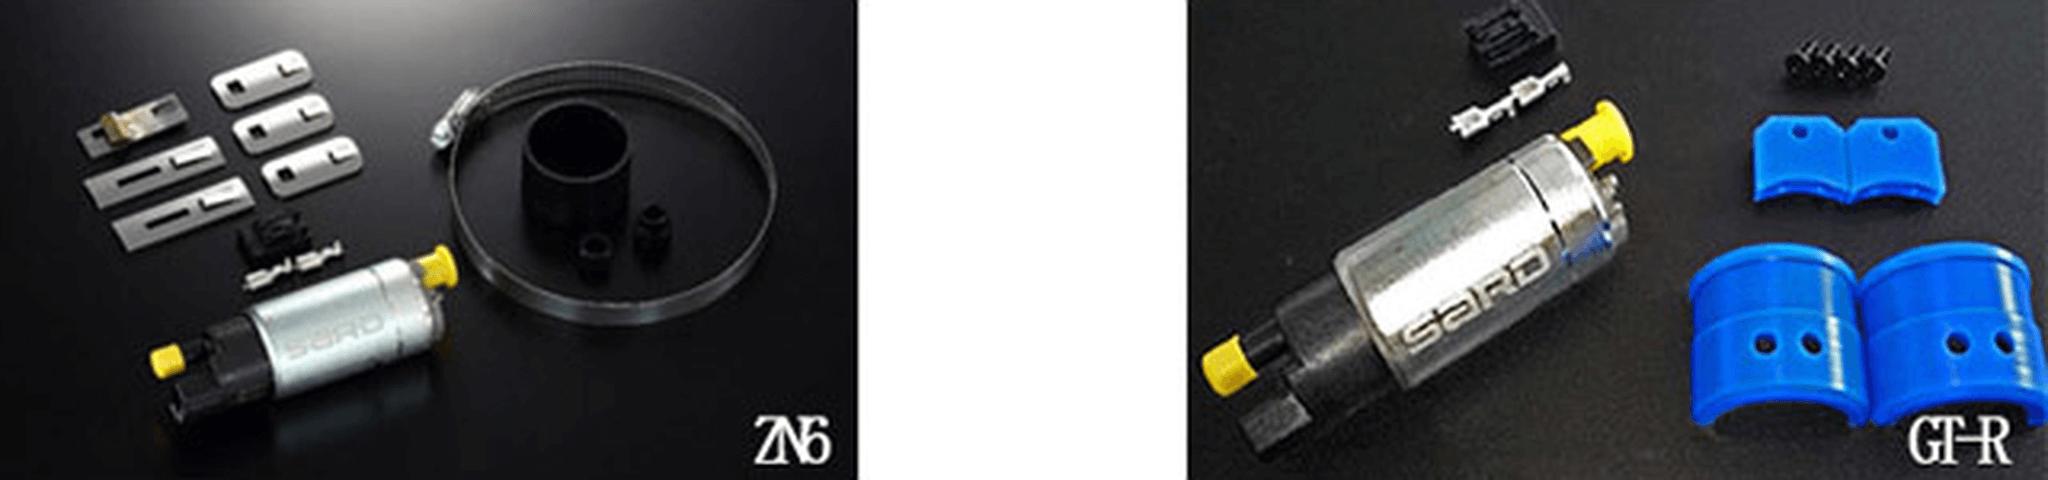 ZN6 FUEL PUMP KIT 275L(ZN6 フューエルポンプキット 275L)